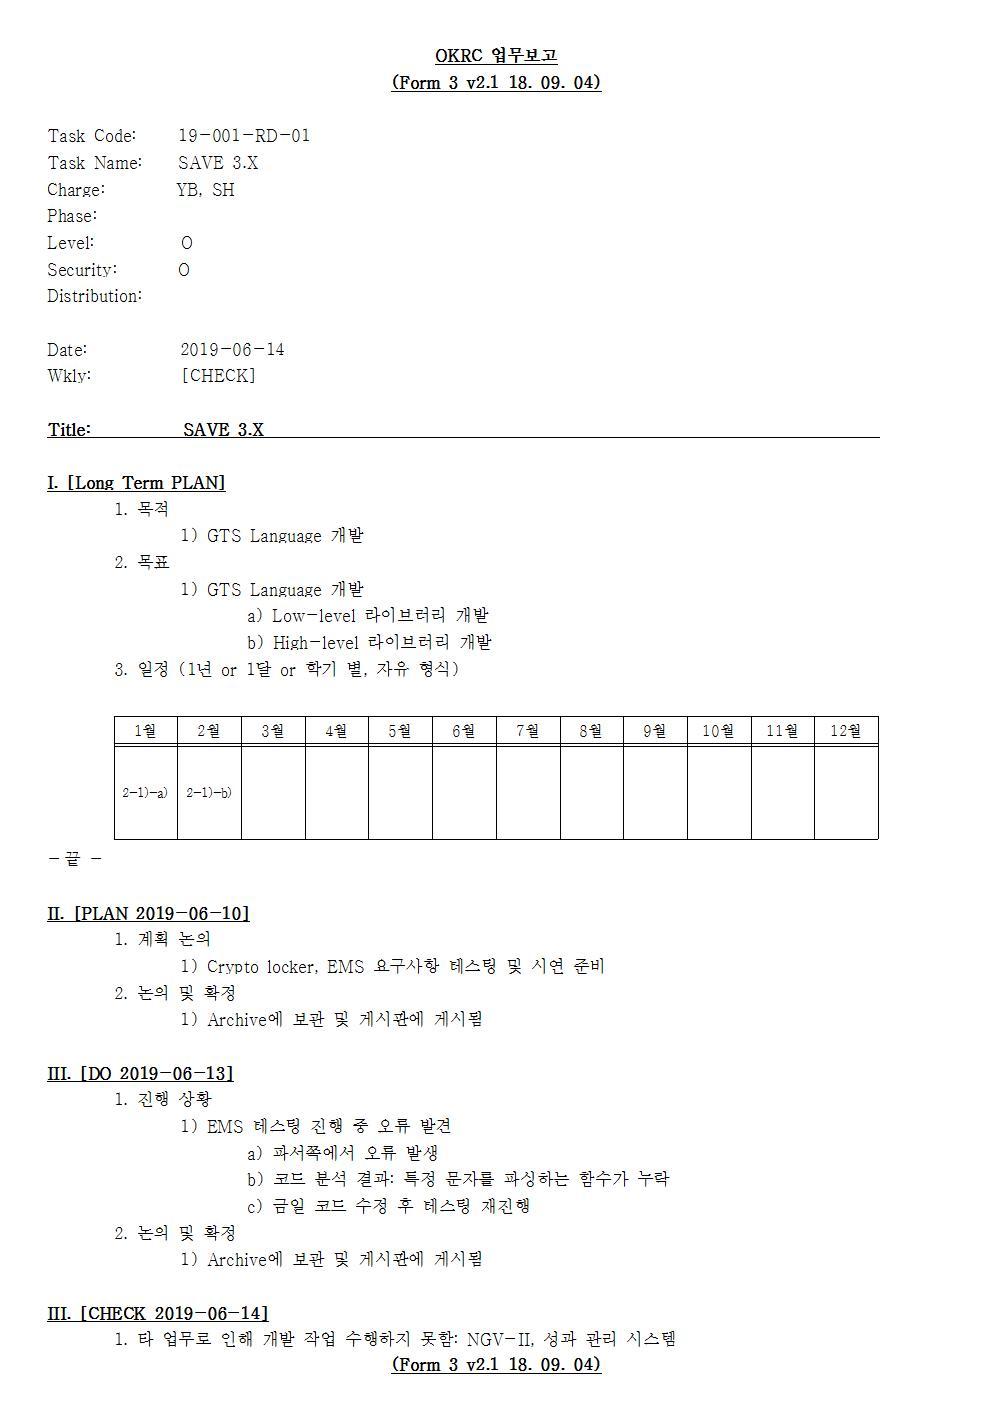 D-[19-001-RD-01]-[SAVE 3.X]-[2019-06-14][SH]-[19-6-2]-[P+D+C]001.jpg